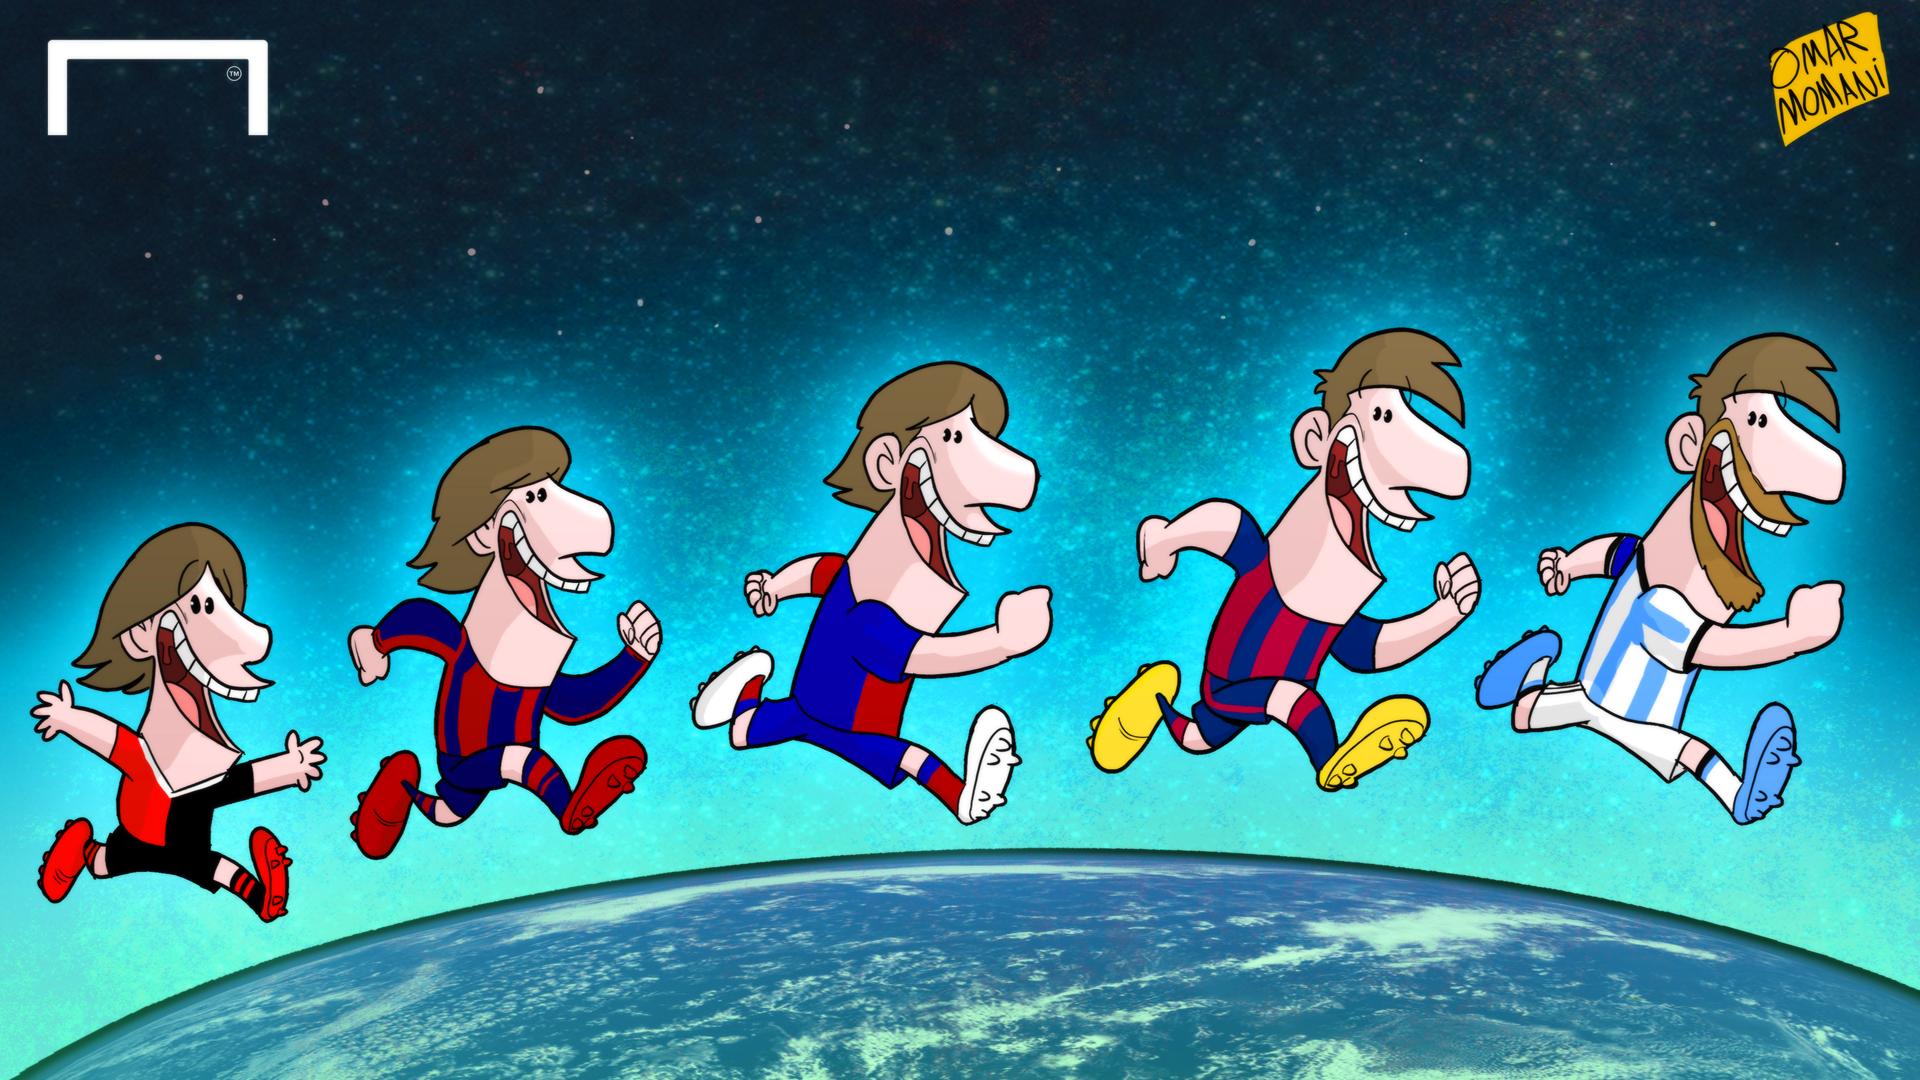 Chamán peruano predice los finalistas de la copa América Messi_1811eijxz9nhm1bdpfnrr9e8yv